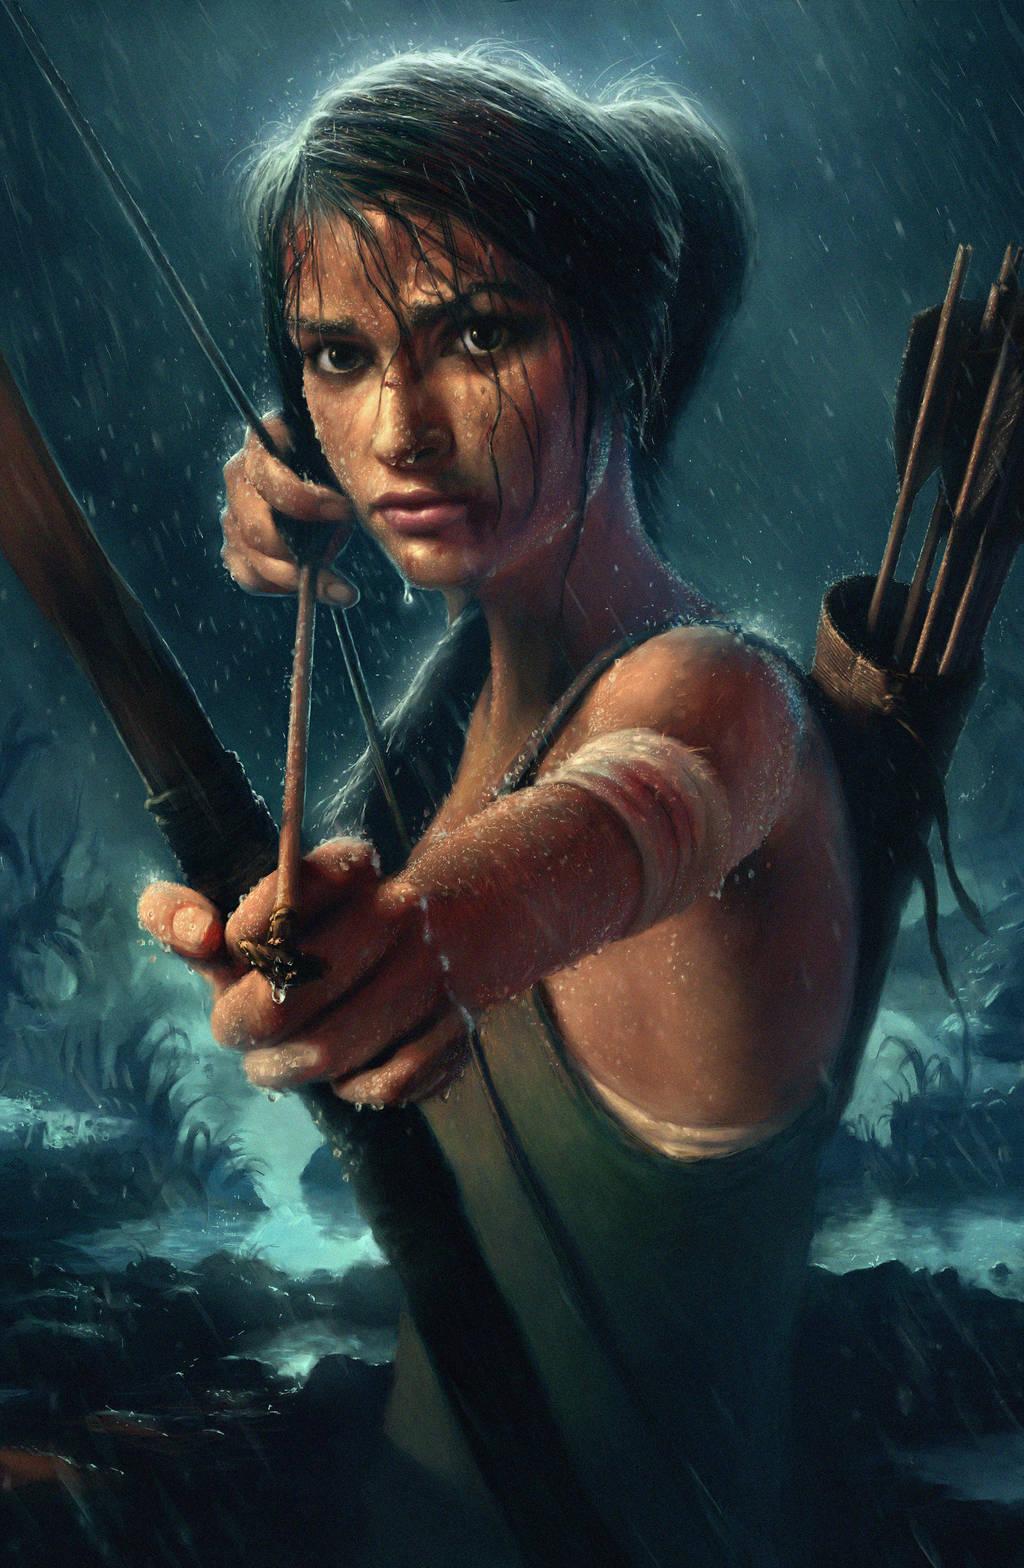 Lara Croft Reborn Contest Entry by mickehill